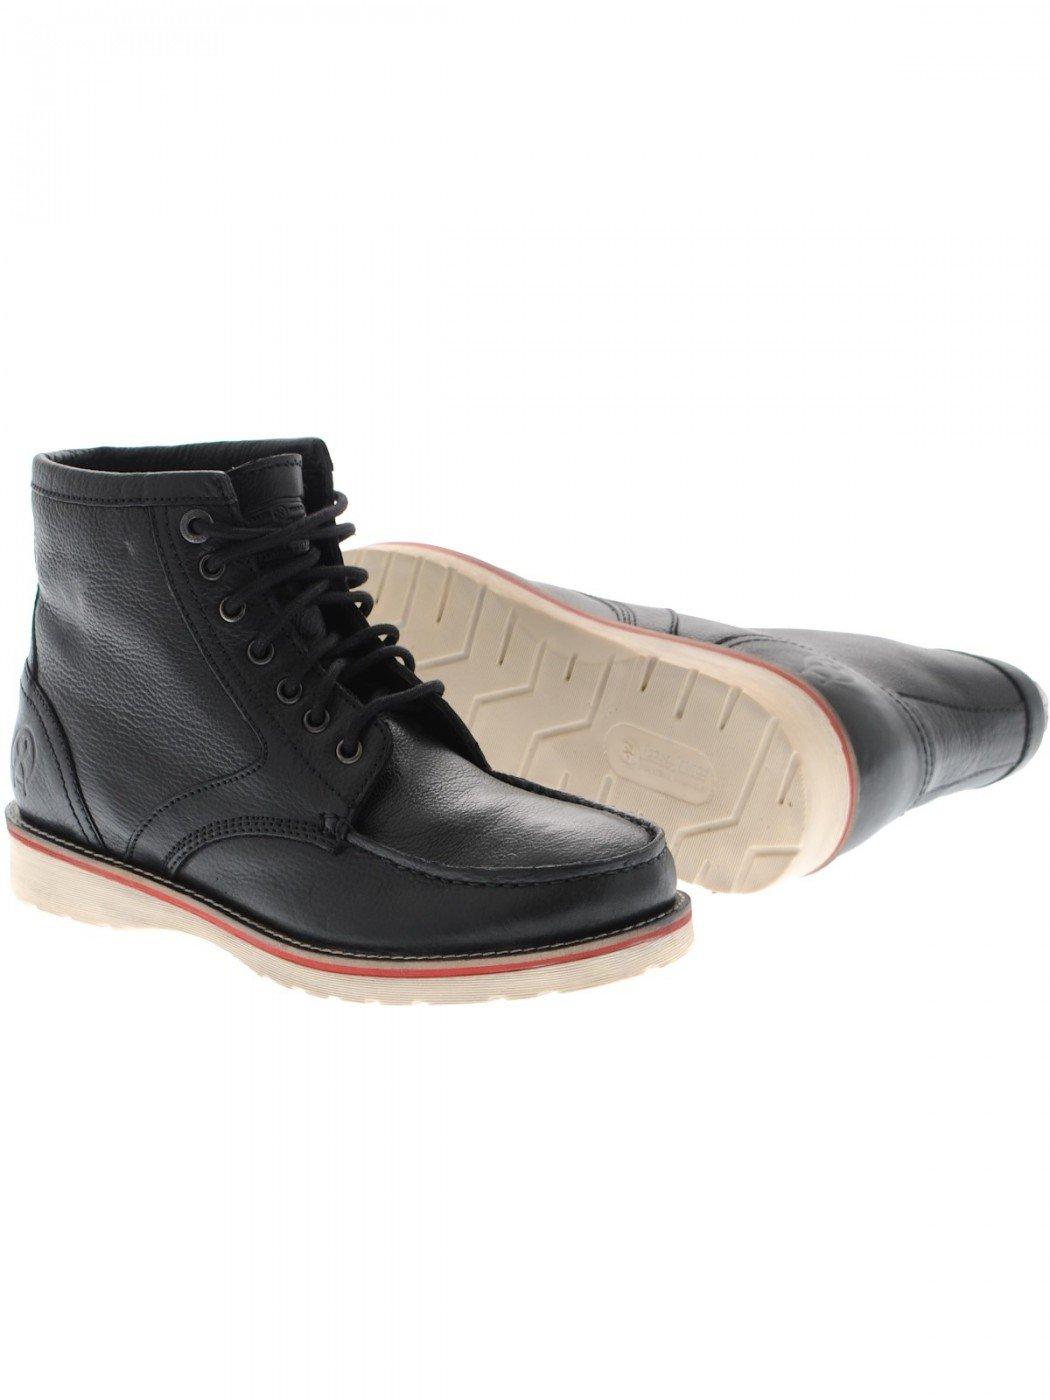 Jesse James Guantes Workwear Safety Boots Hombre Botas Piel Impermeable 46|negro